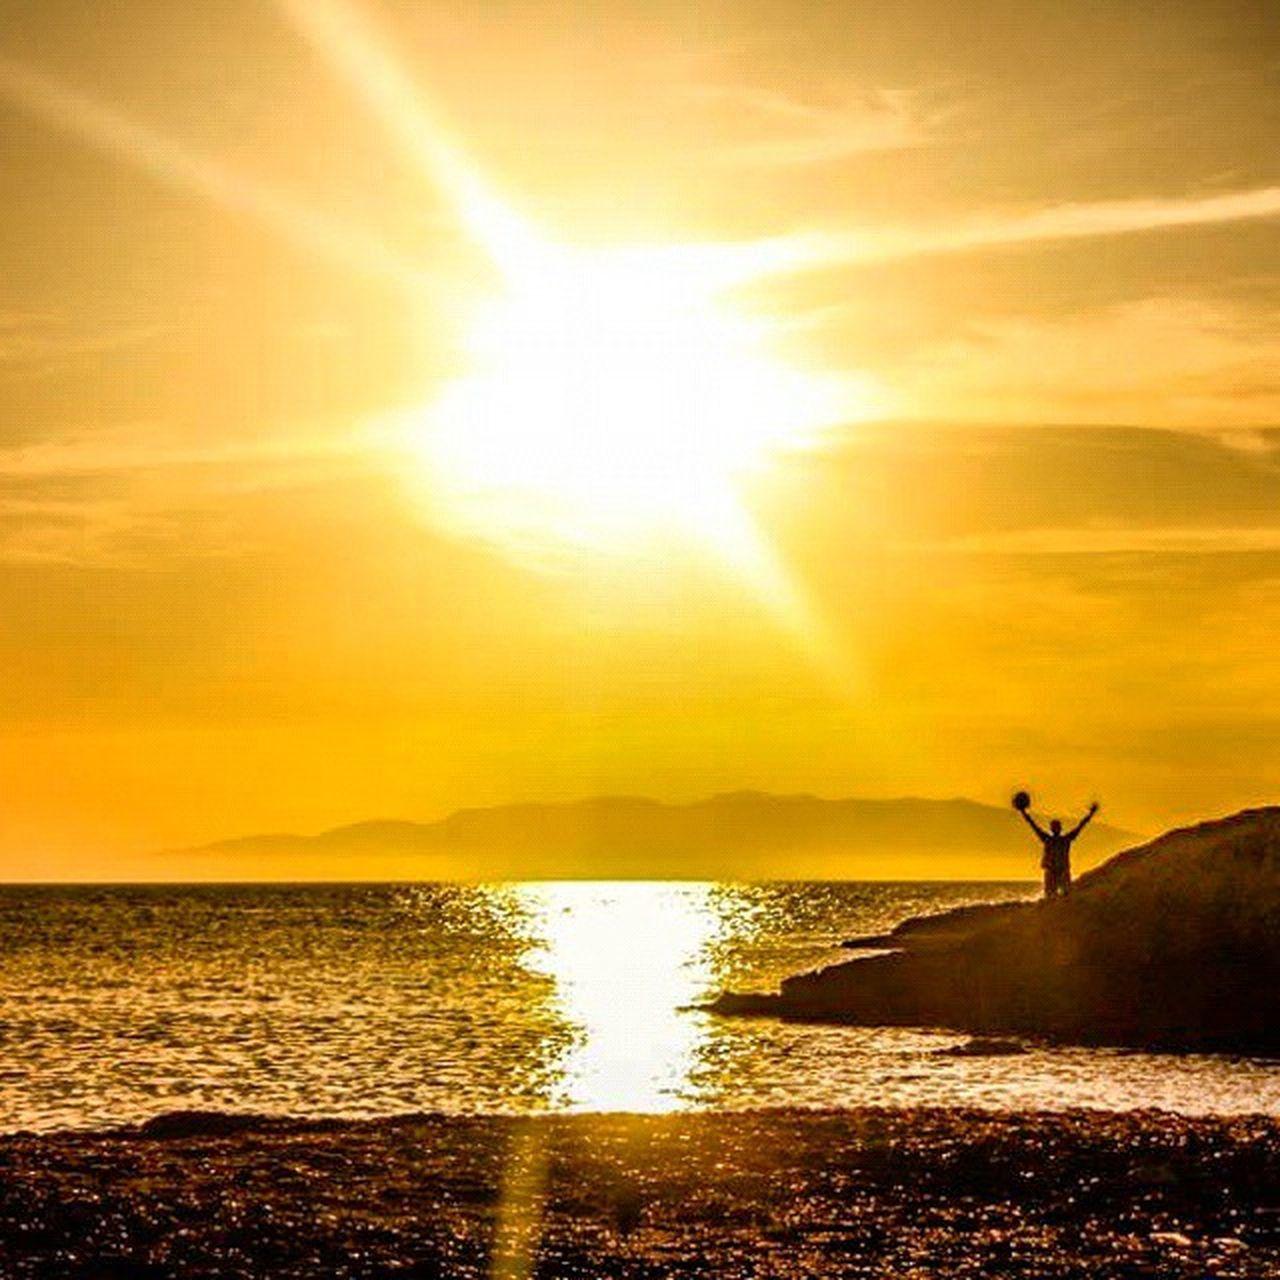 Golden sunset from eastern morocco ! View from: Sid_el_bachir Beach Berkane Morocco Sunset Playa Golden Landscape Calm Beach Sea Meditation Relaxing Nature Beauty Naturelovers Adventure Funnytumblr Worldstagram Worldtraveler Igmorocco Ig_morocco Vscocam Picoftheday Life lifestyle maroc marok